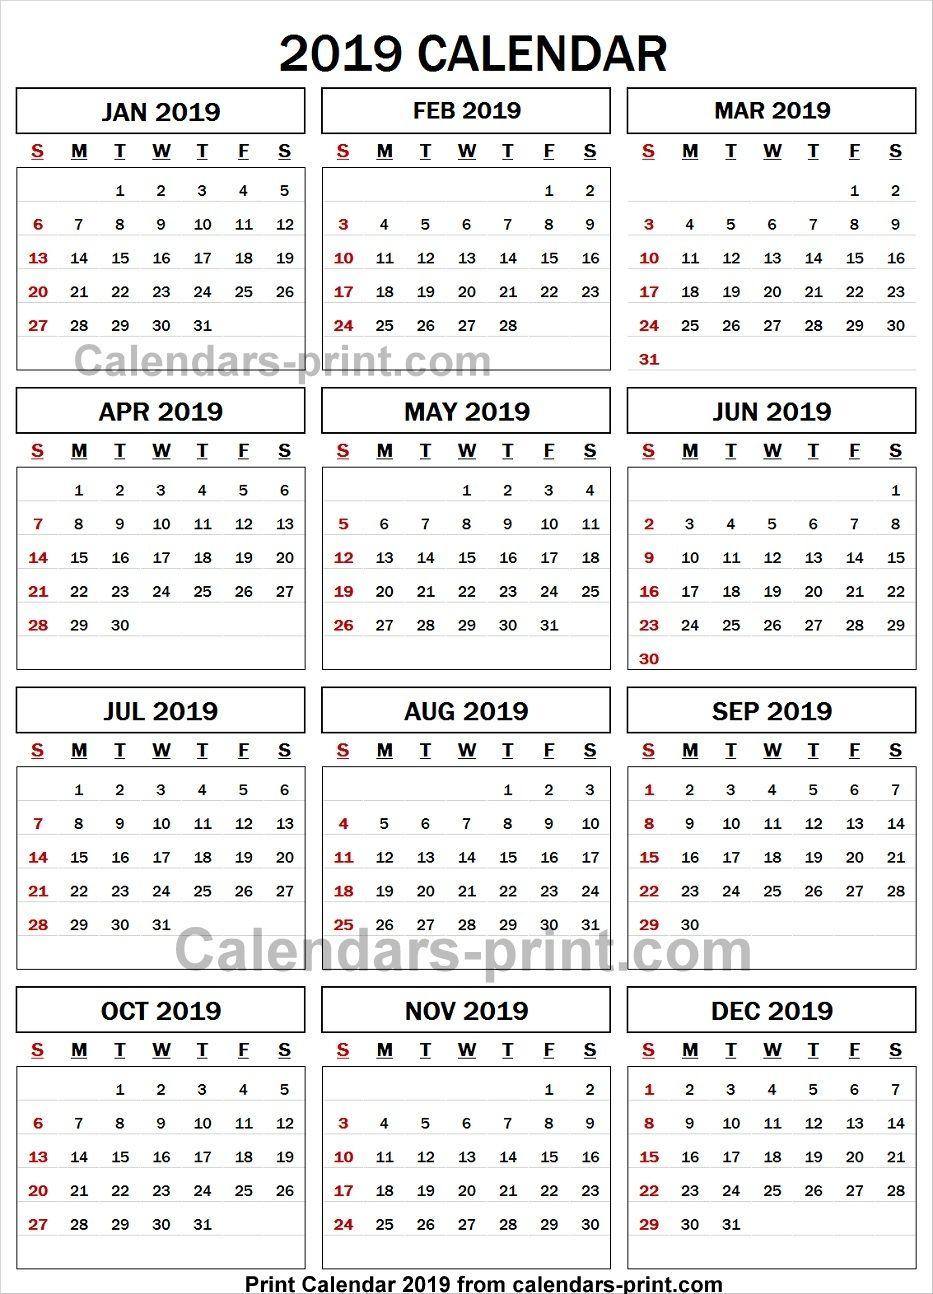 2019 Calendar Spreadsheet | Calendar, Spreadsheet